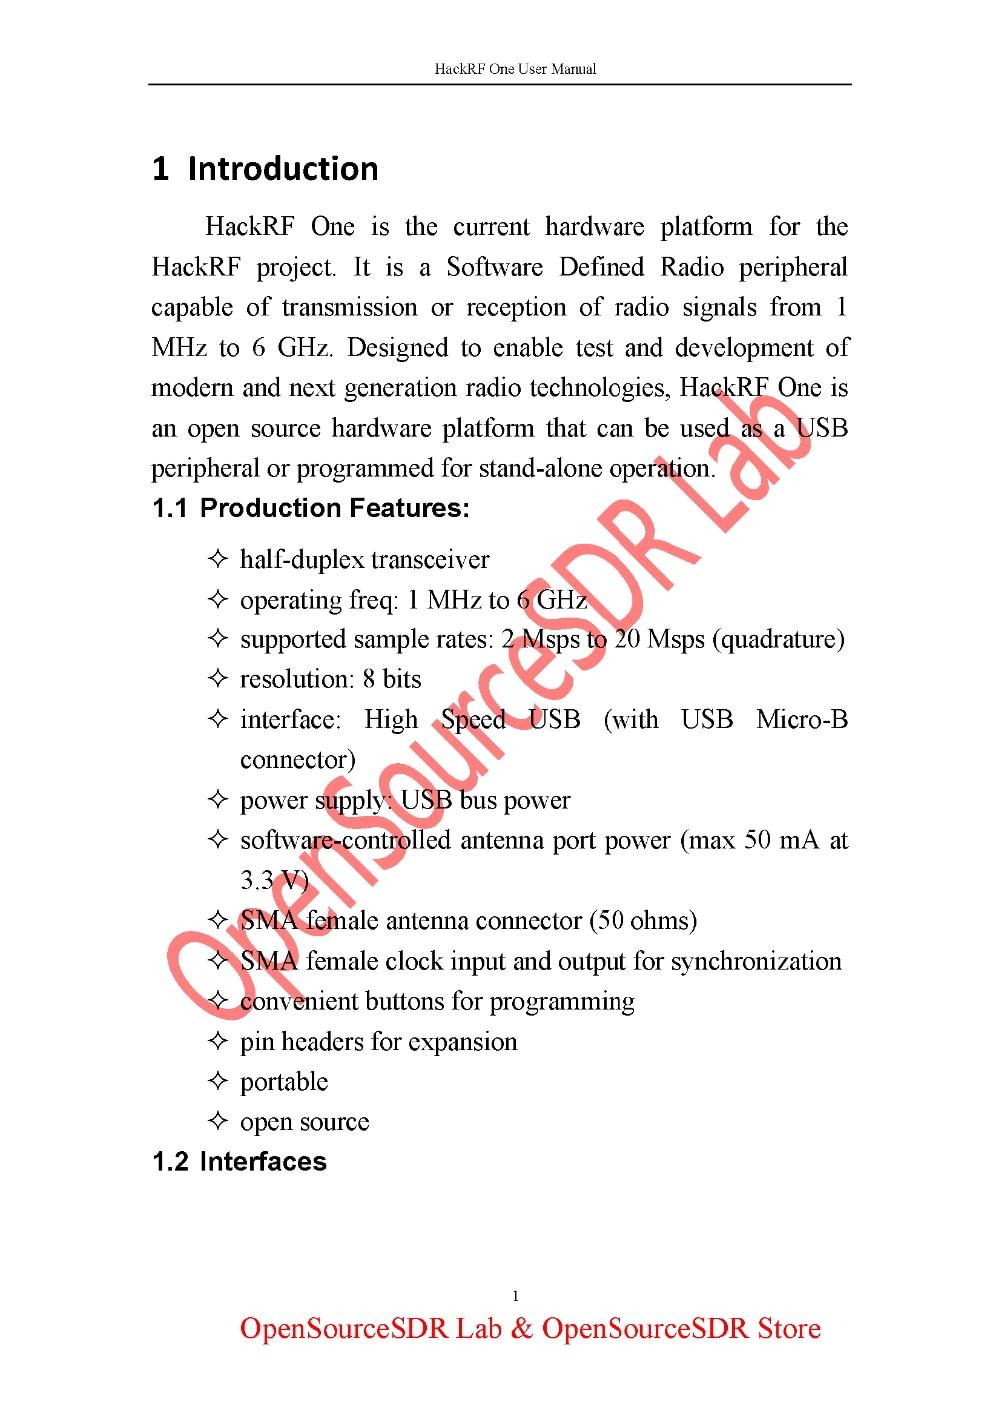 HackRF One User Manual_页面_03